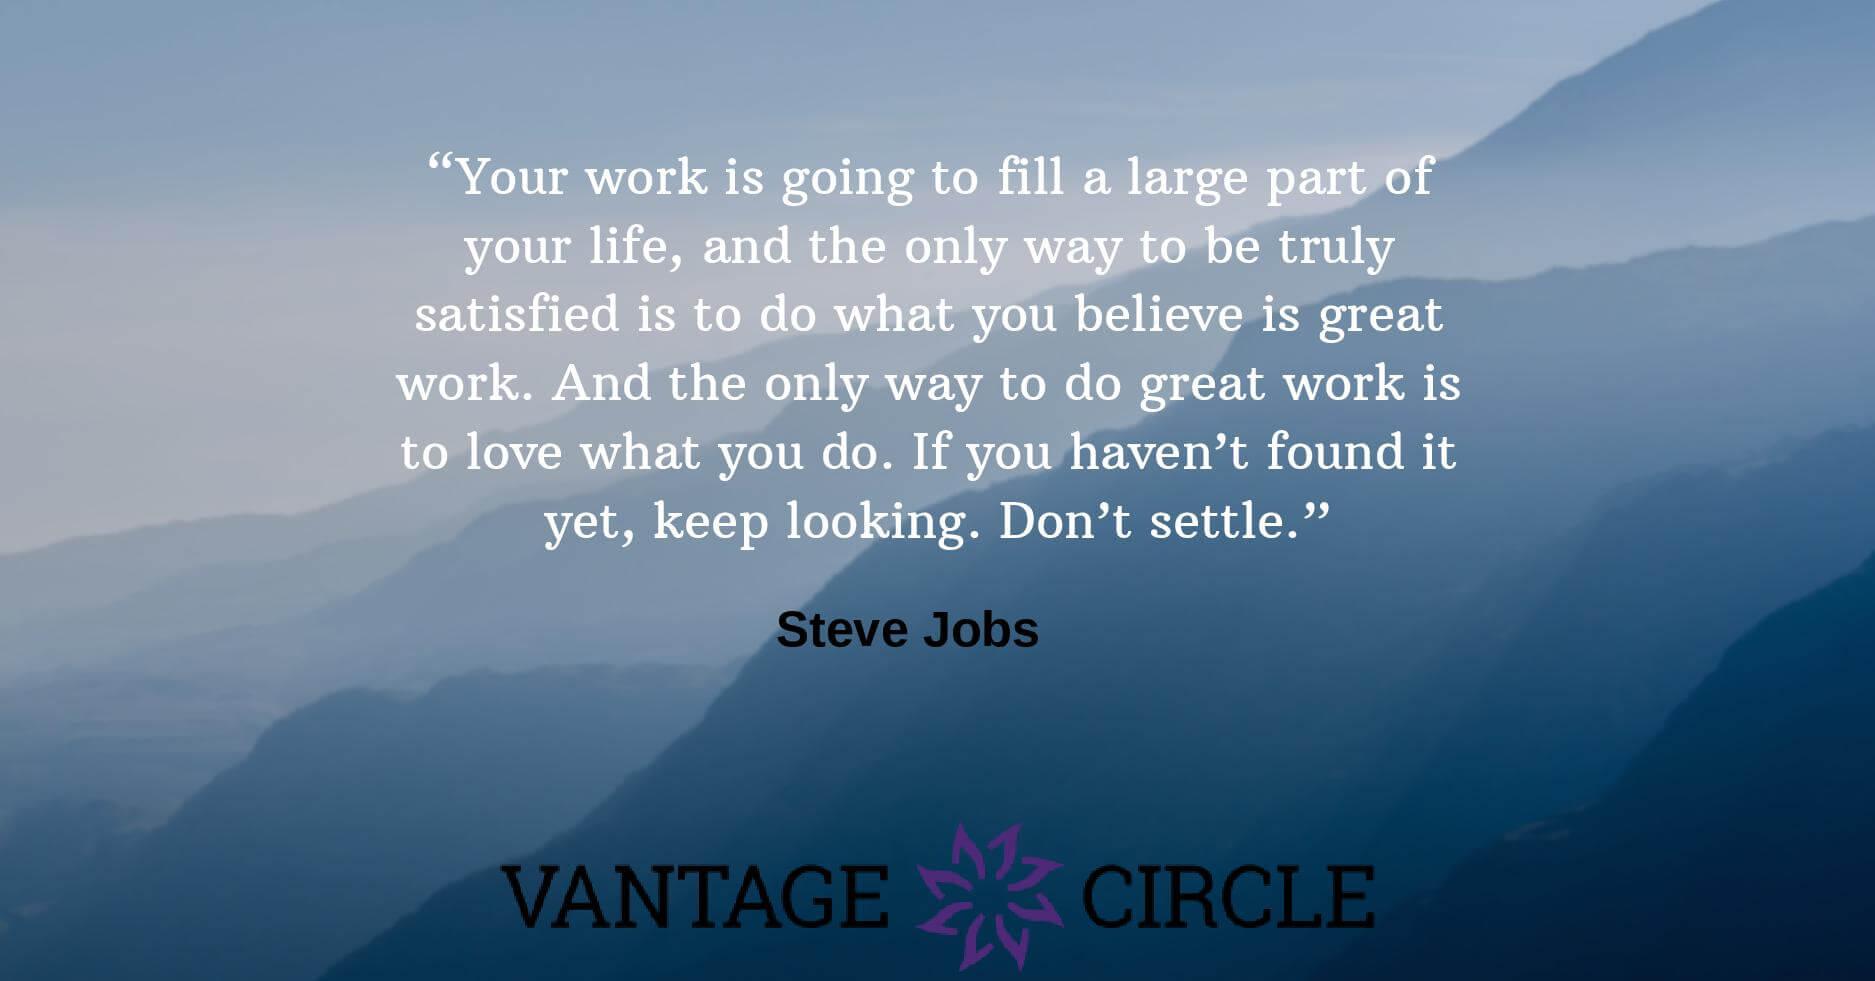 Employee-motivational-quotes-Steve-jobs